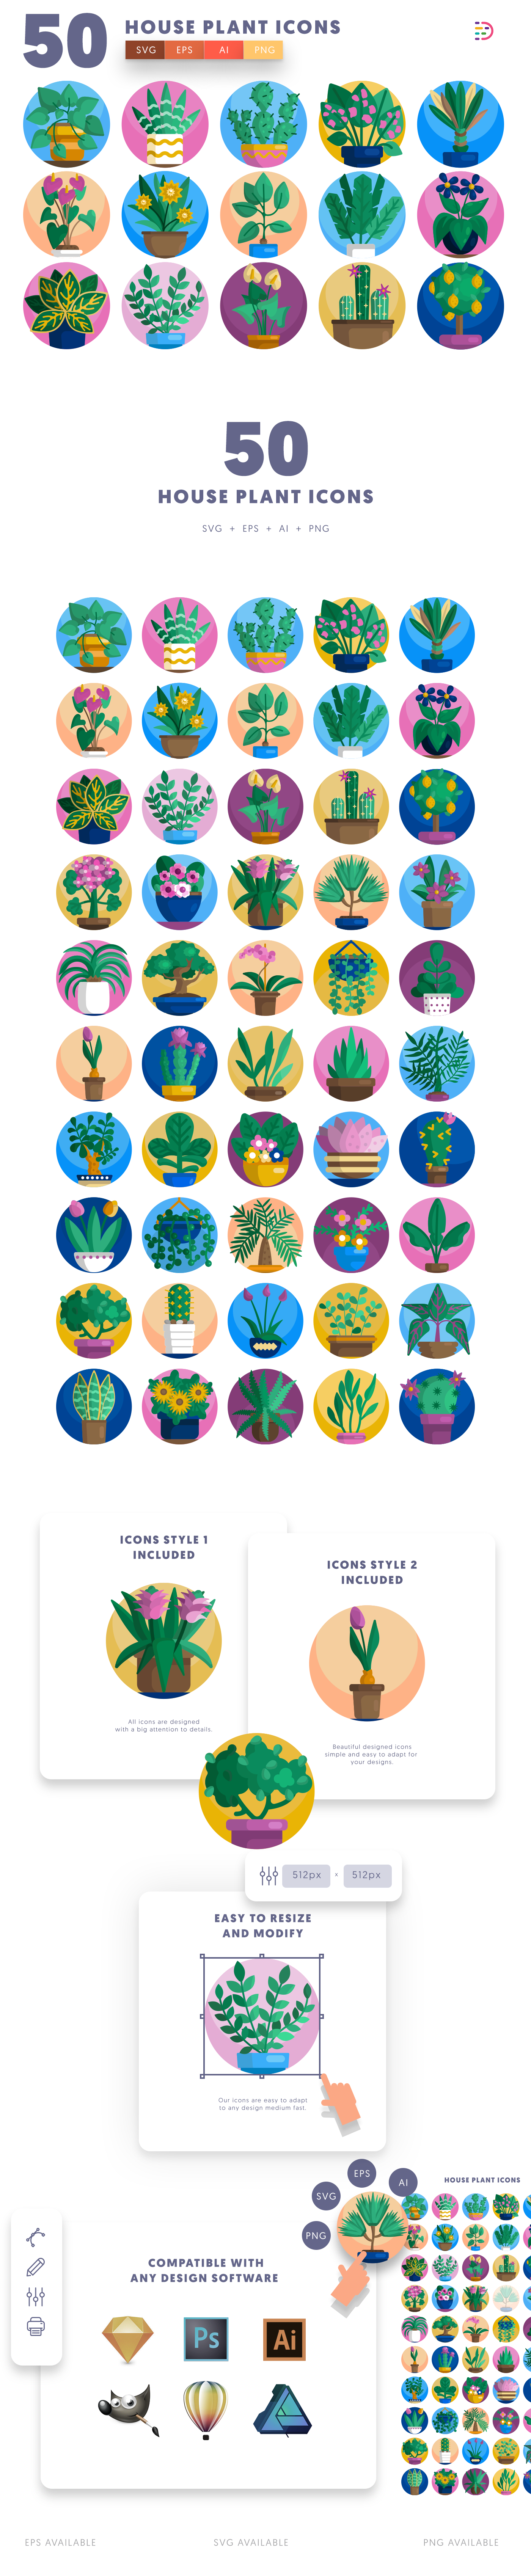 50 House Plant Icons list